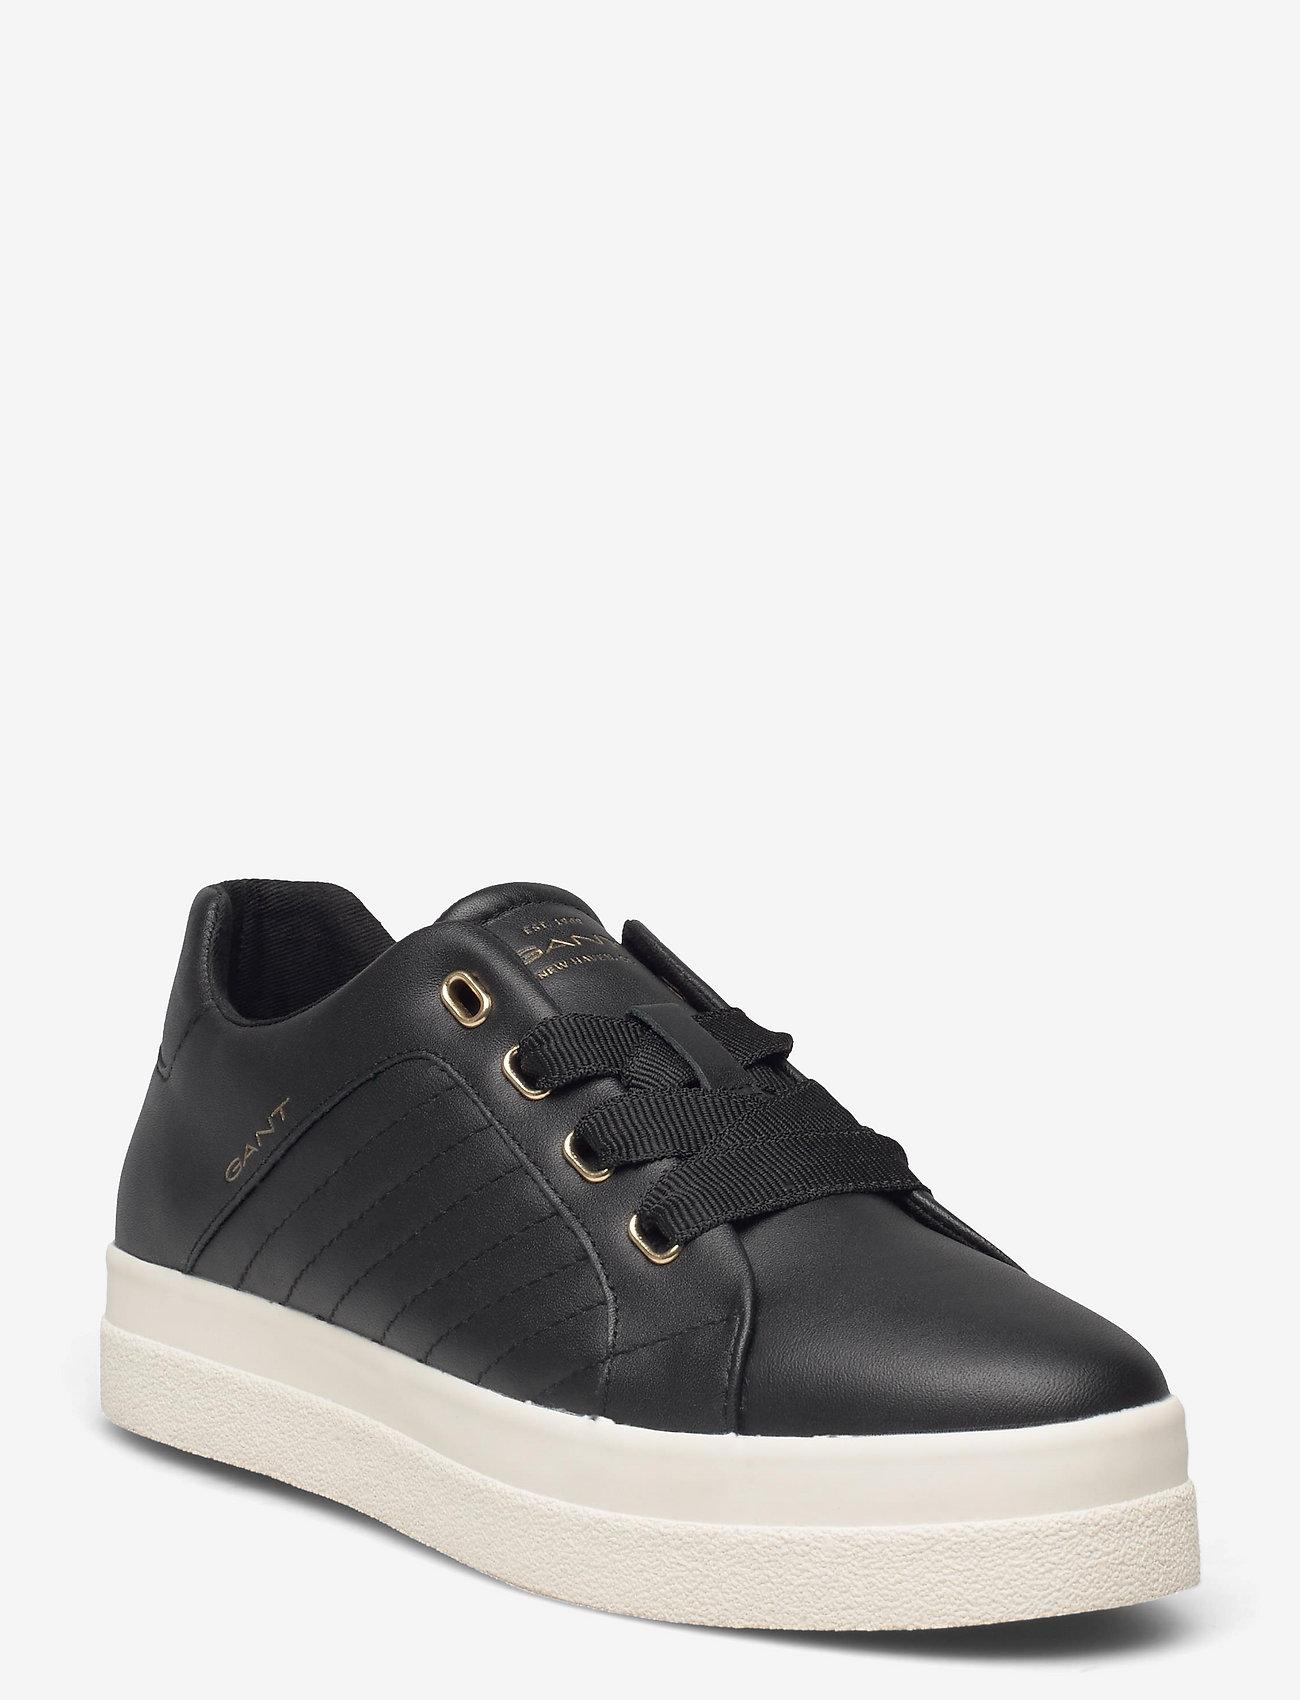 GANT - Avona Low lace shoes - low top sneakers - black - 0